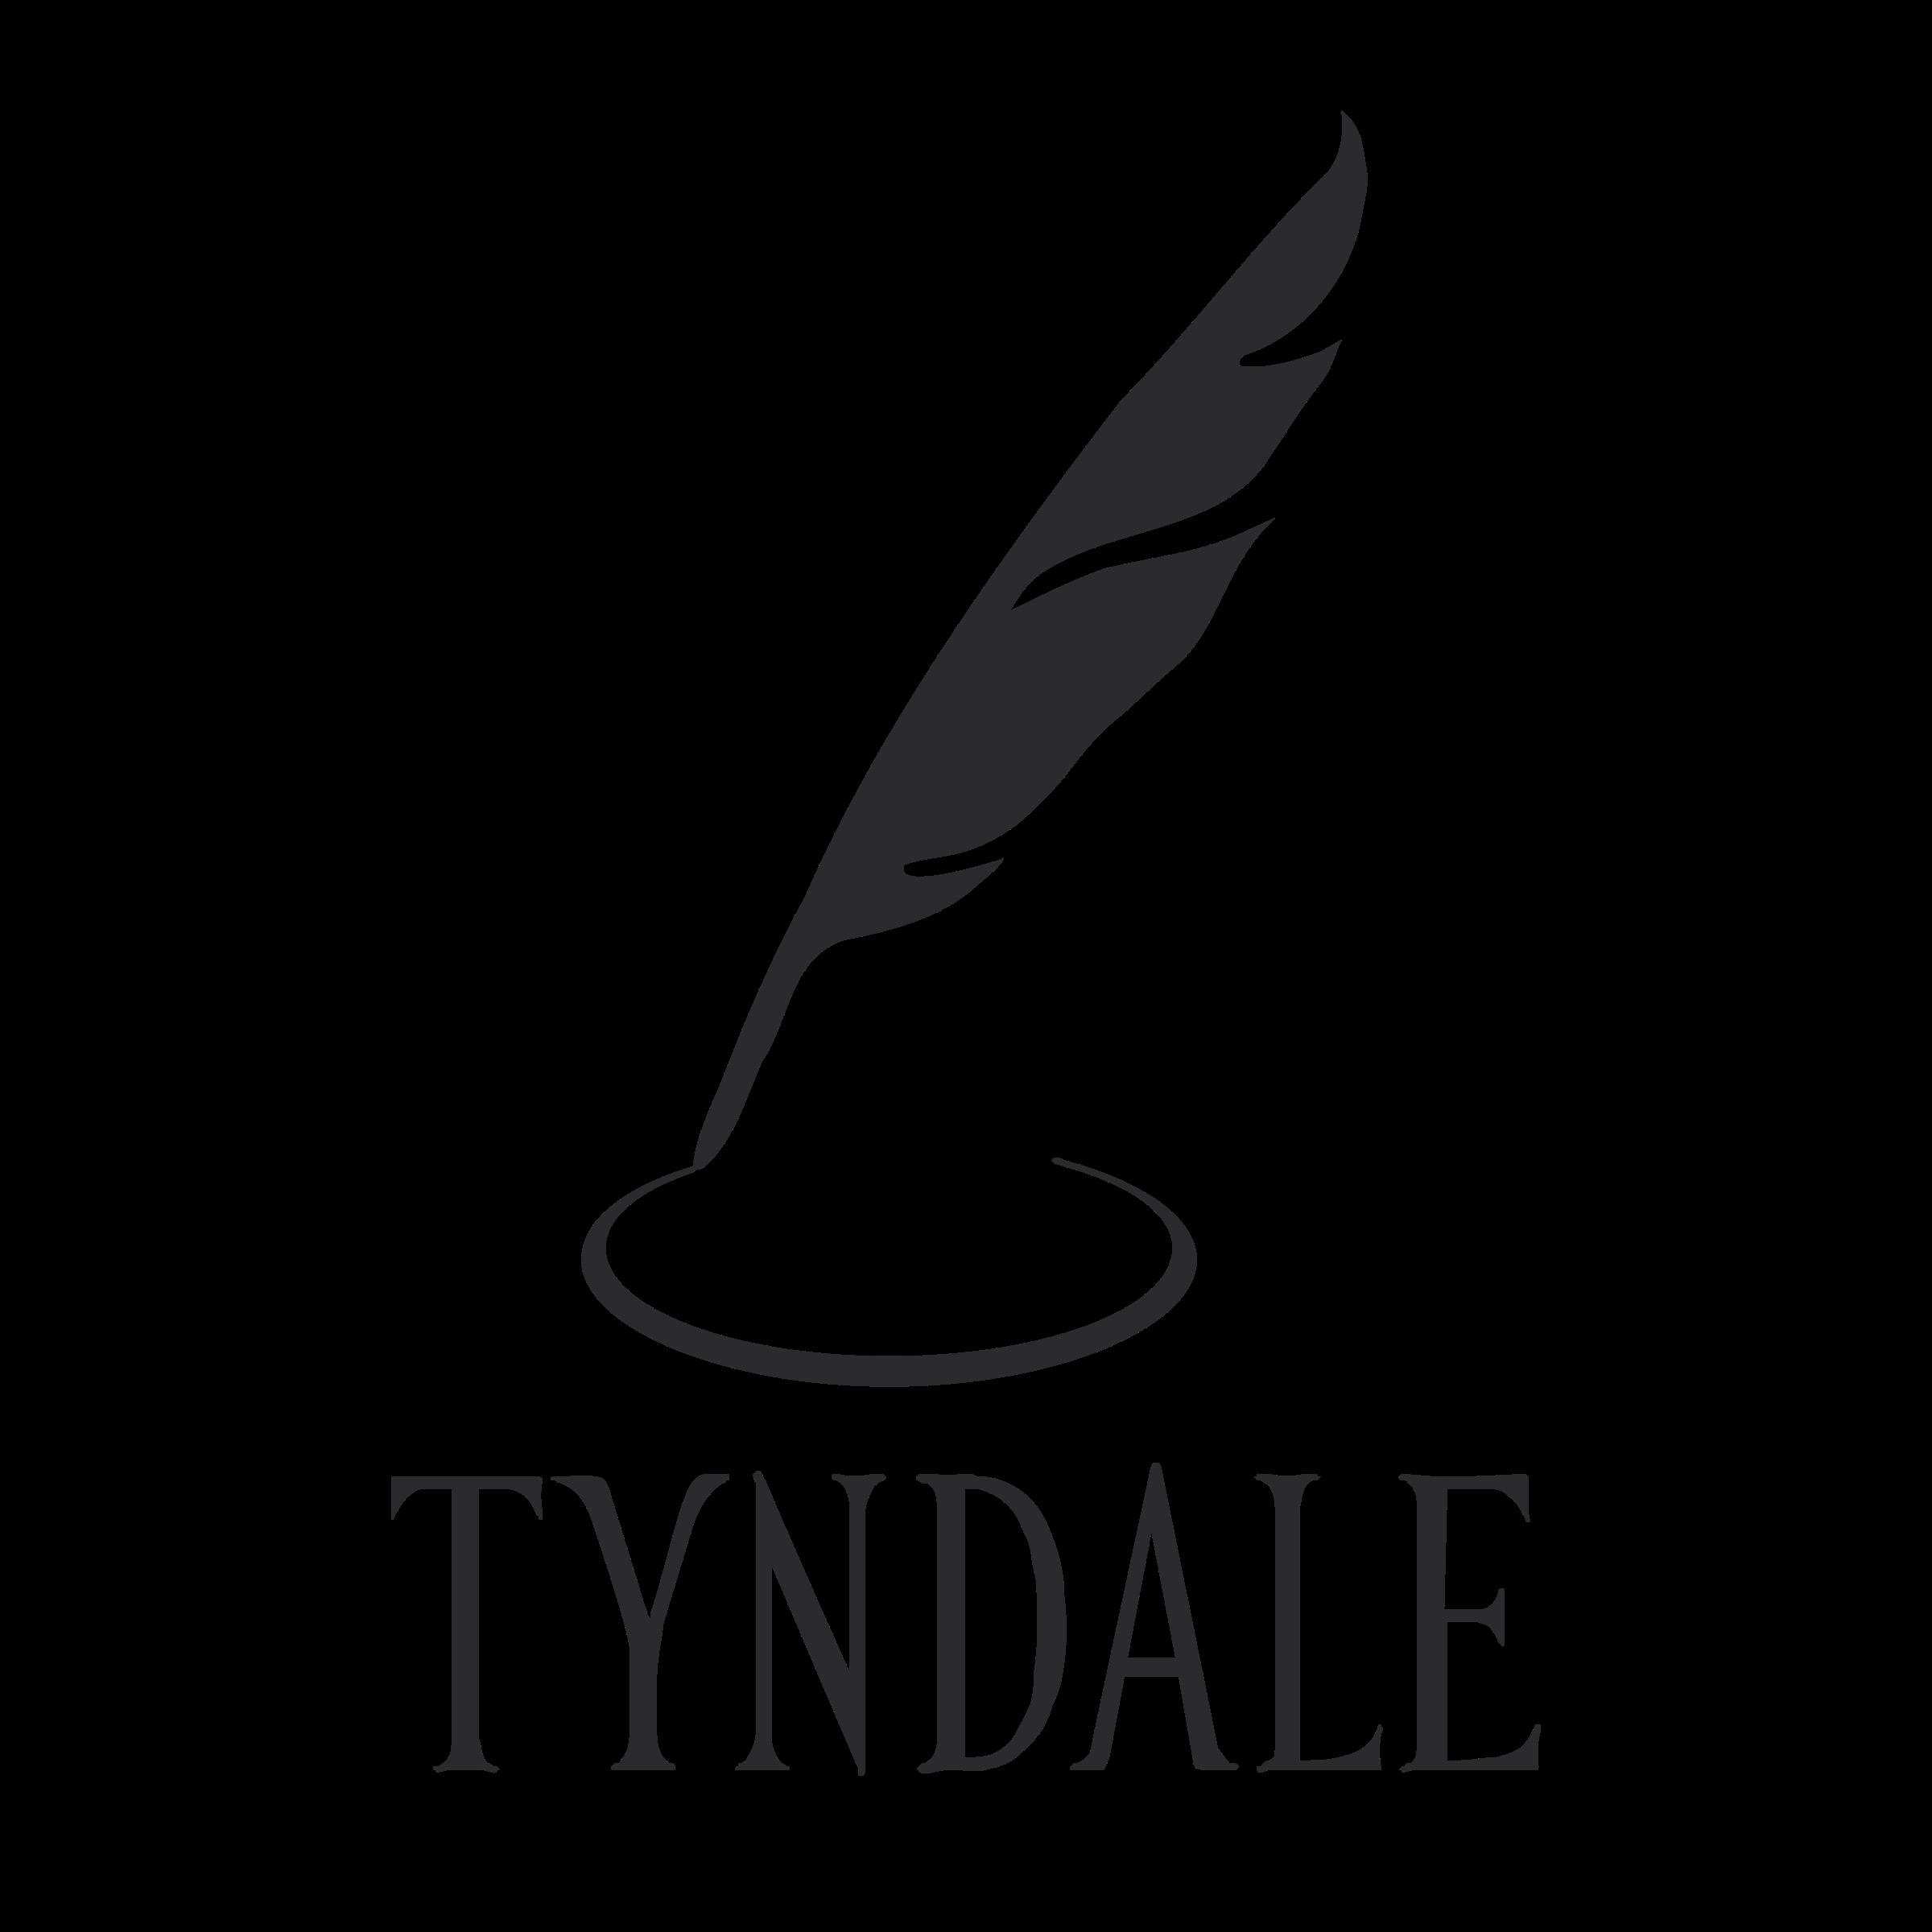 tyndale-logo-png-transparent